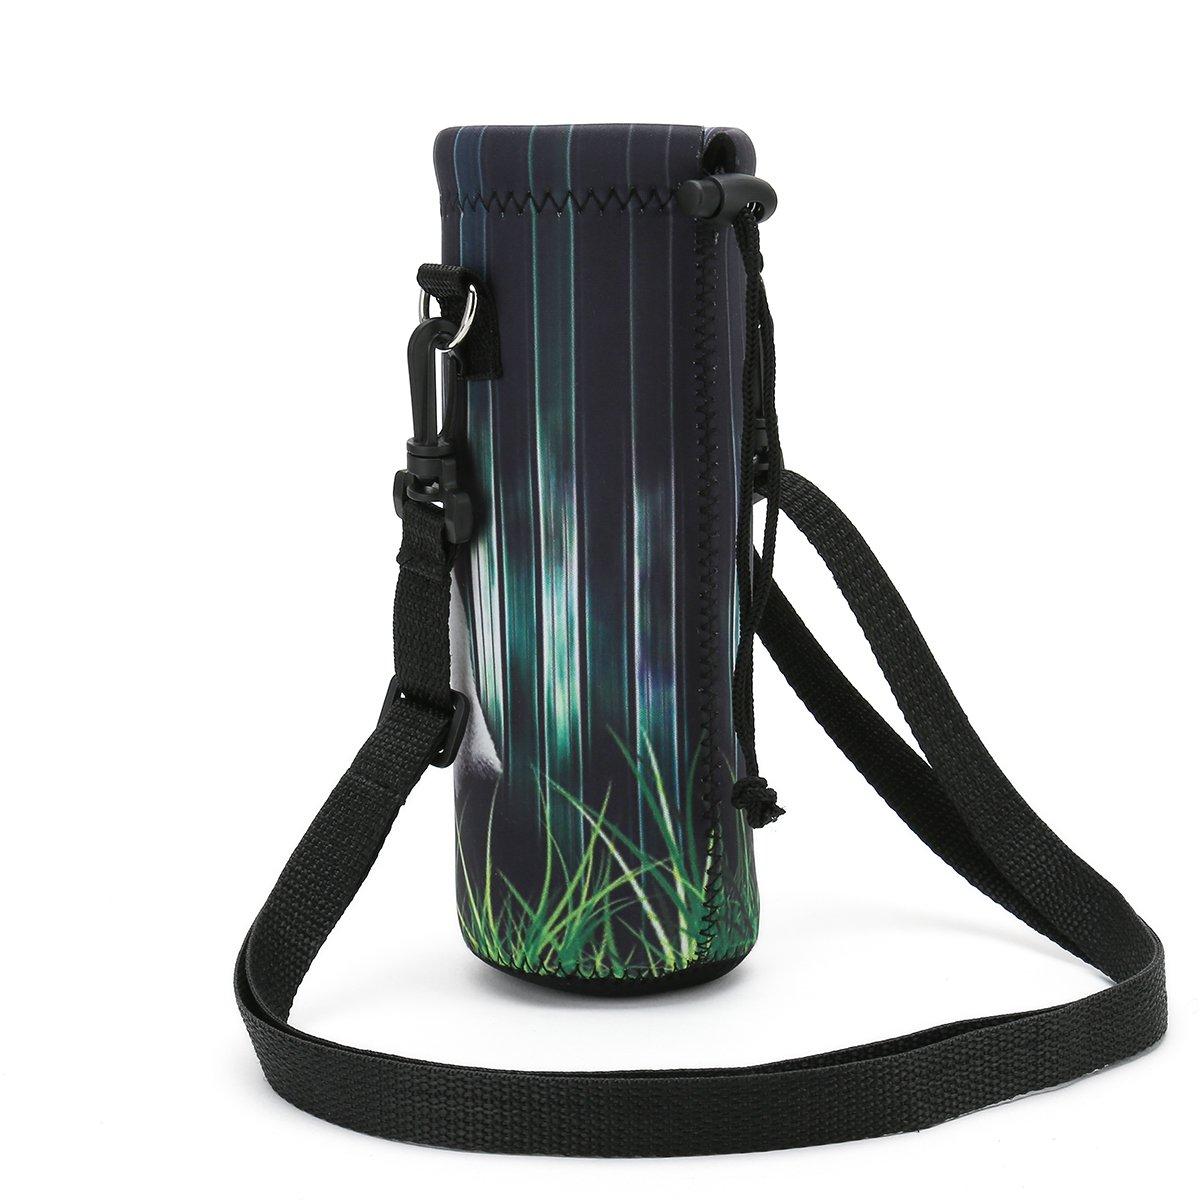 500 ml Neoprene Wine Tea Bottle Sleeve Holder Sling Insulated Outdoor Sports Camping Travel Cross-Body Shoulder Bag Case Pouch Cover ICOLOR Water Bottle Carrier 18 Oz